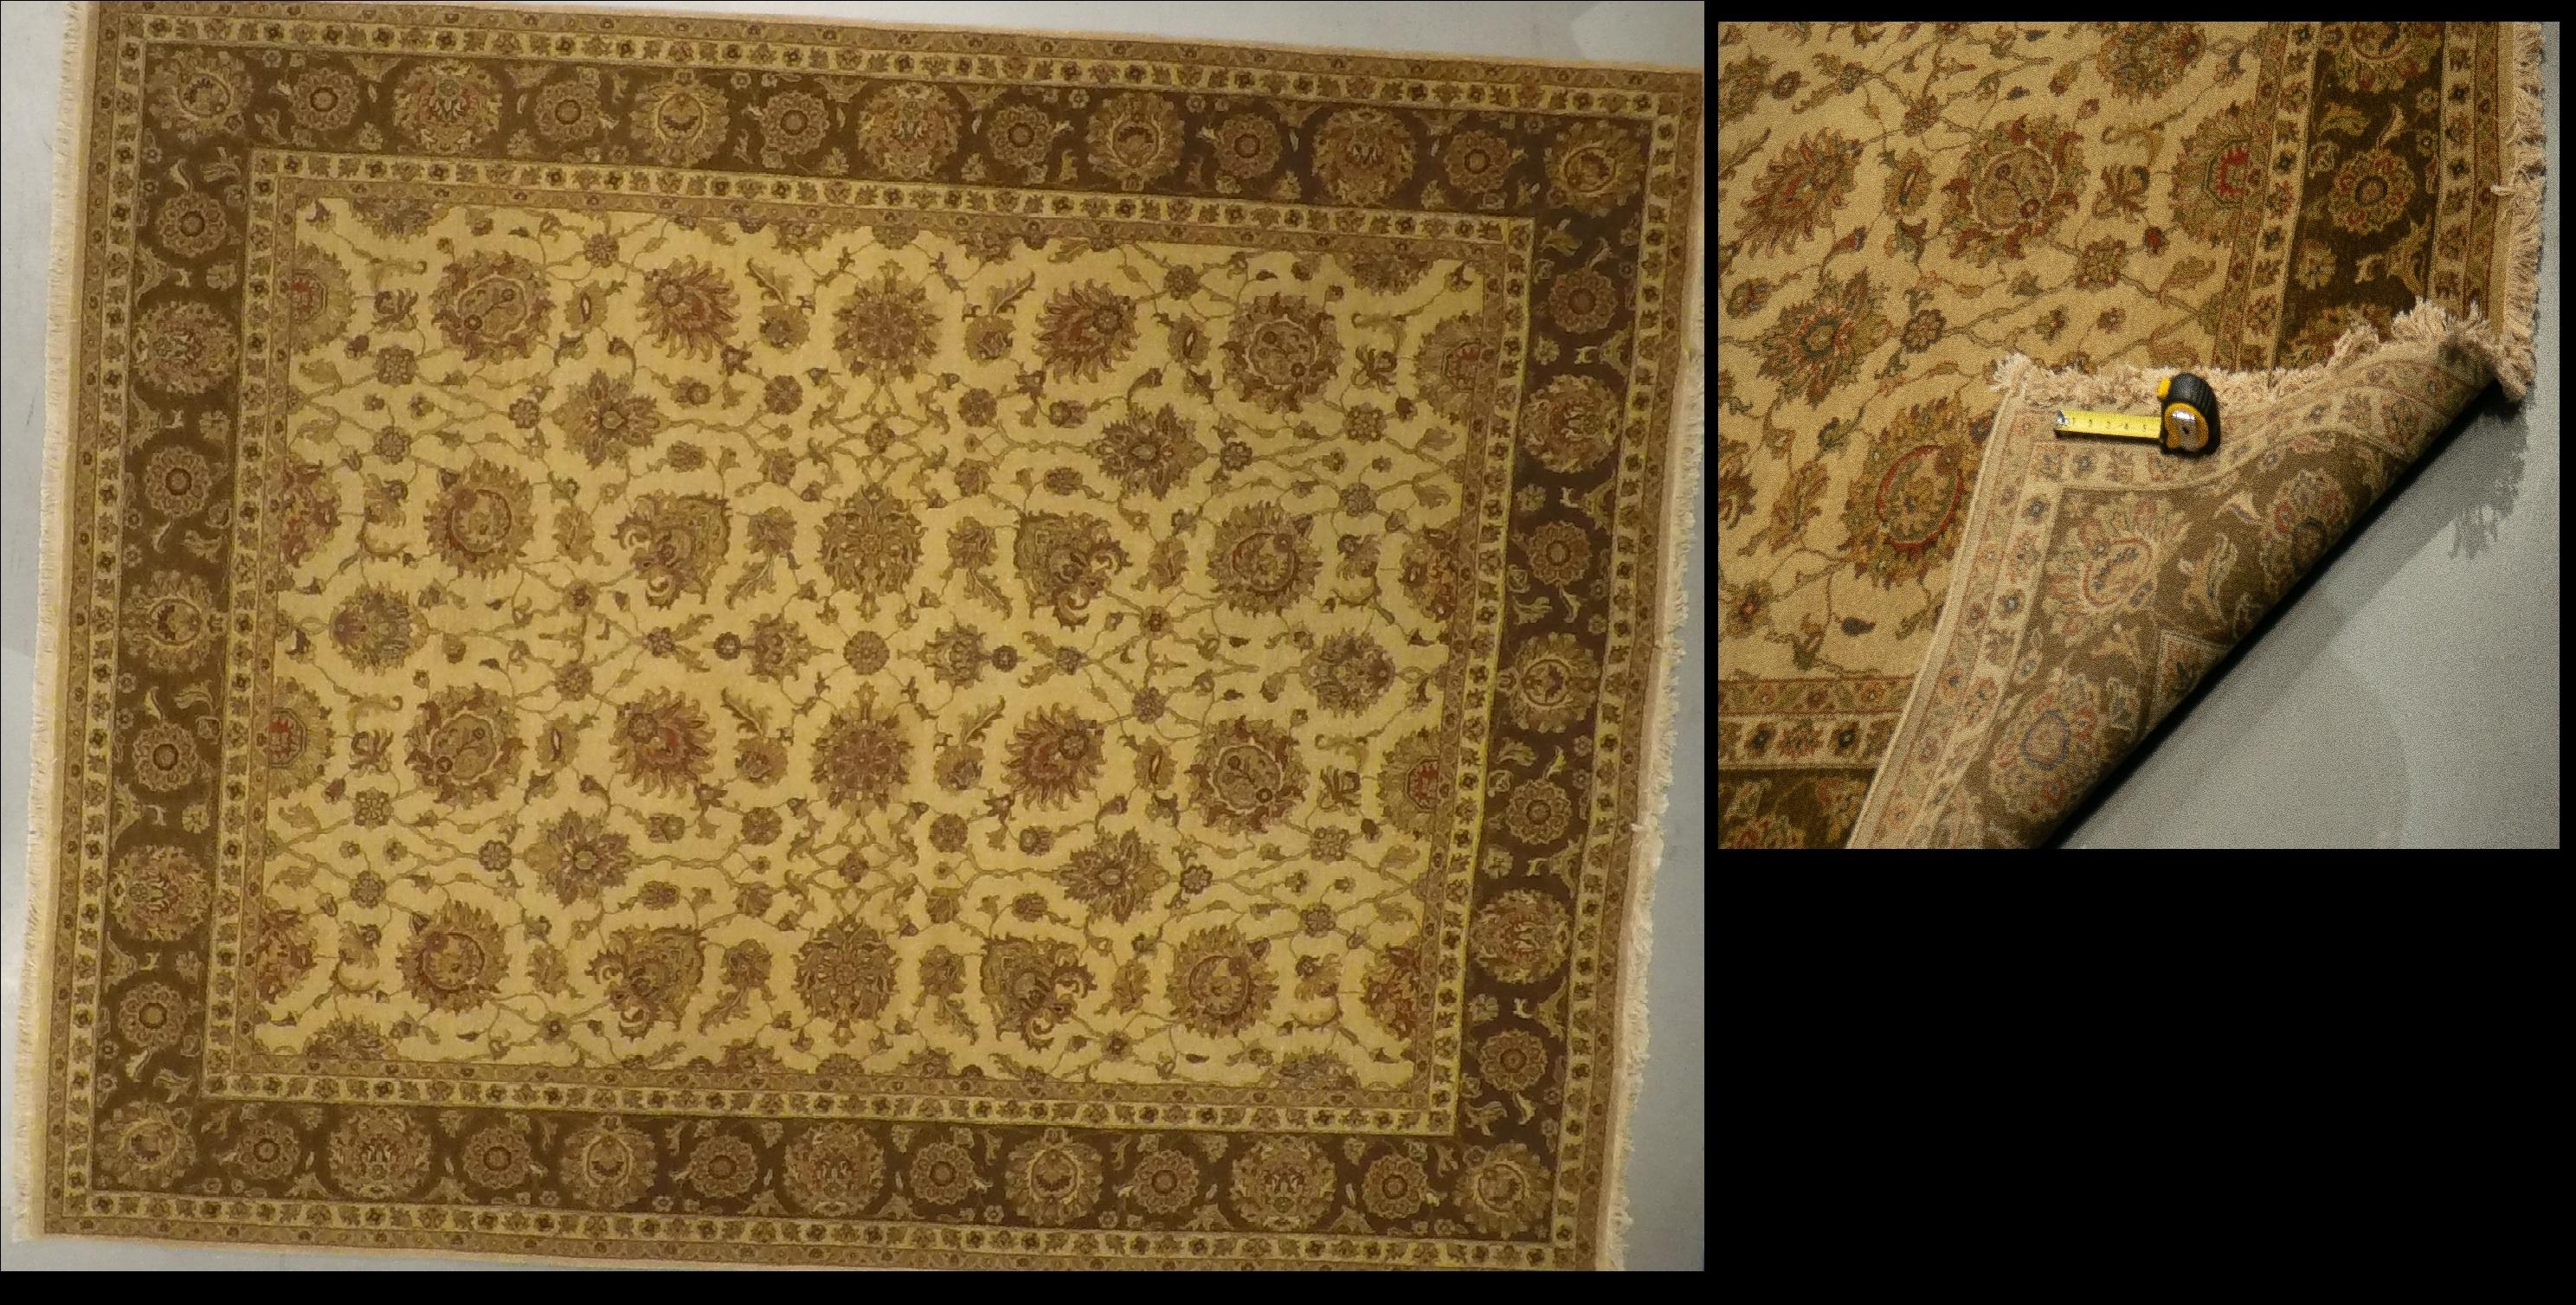 LD 65 3716 (8.1 x 10.2) Wool-Handmad